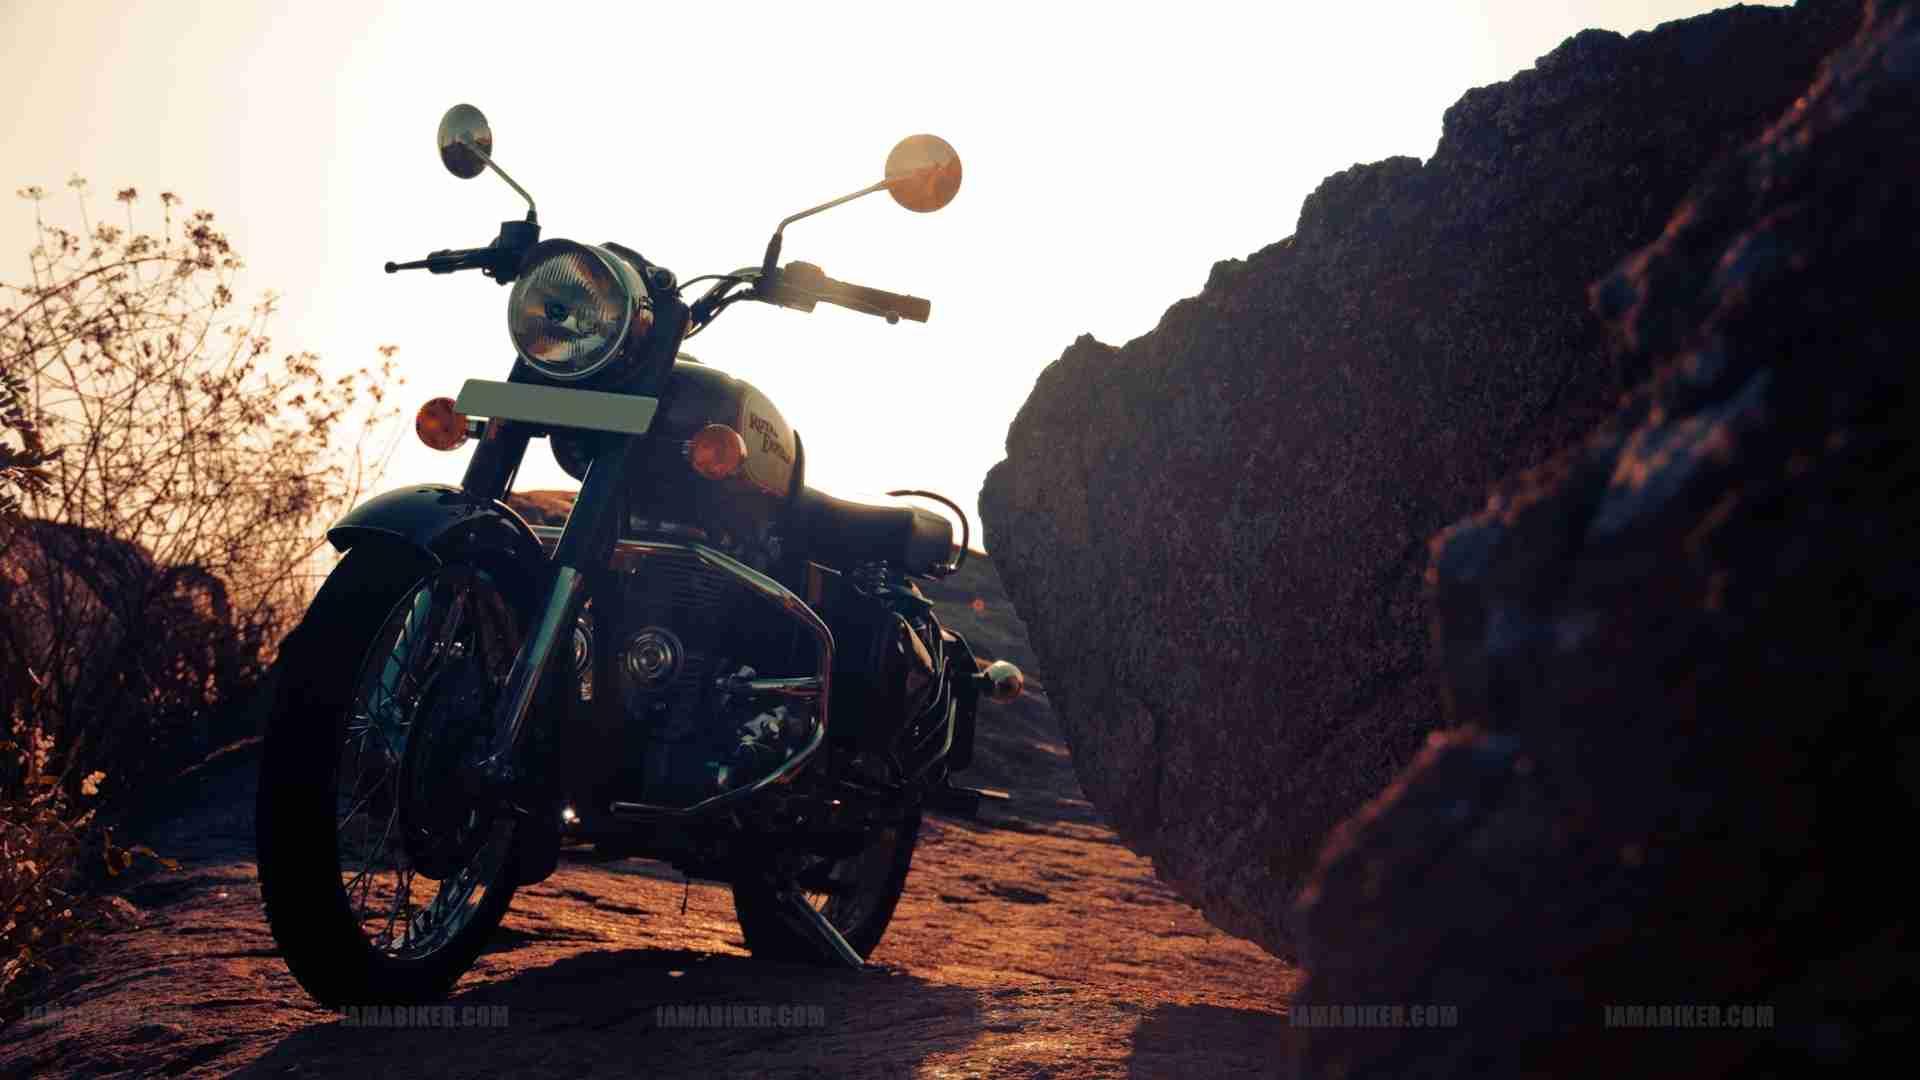 IAMABIKER - Everything Motorcycle